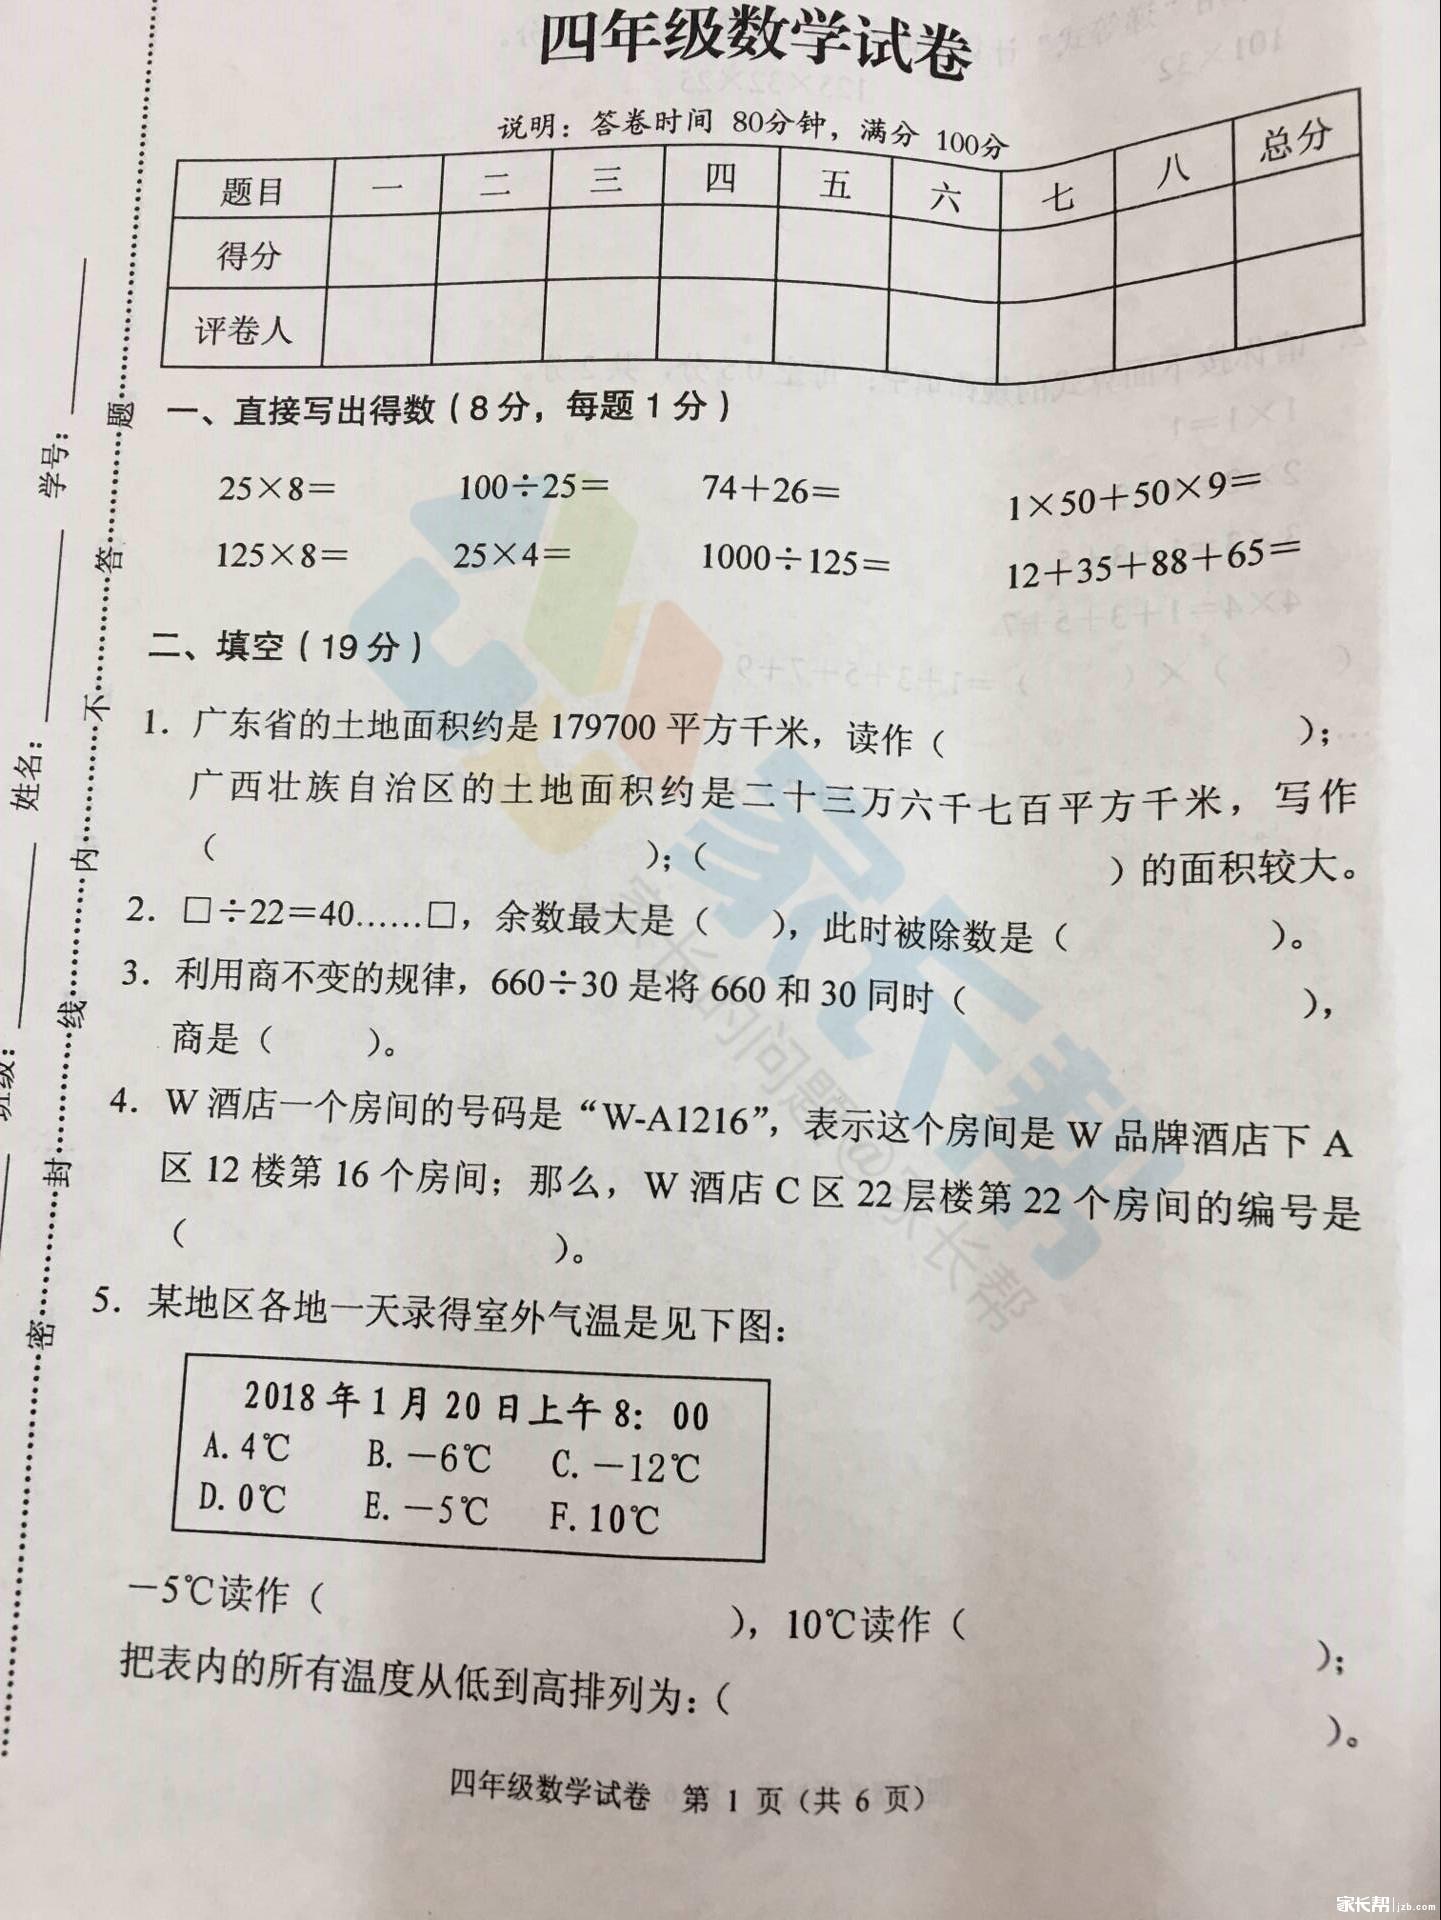 QQ图片20180122163745_副本_副本.jpg